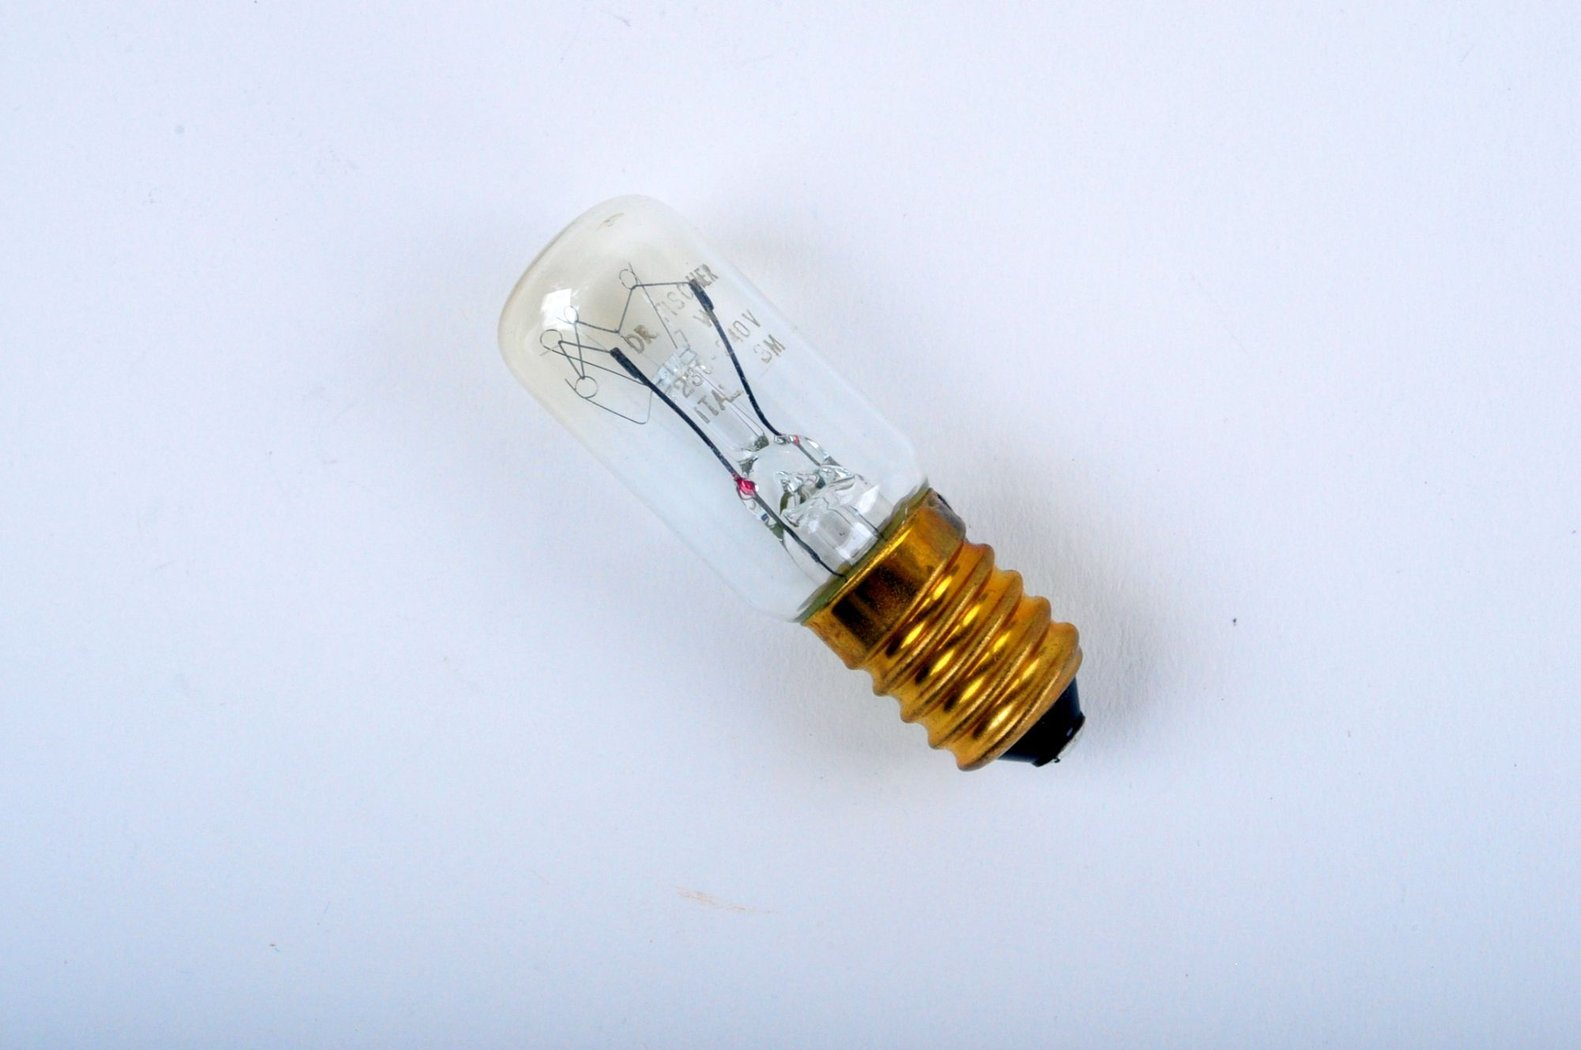 AEG Electrolux Lampe Glühbirne 7 Watt Wäschetrockner